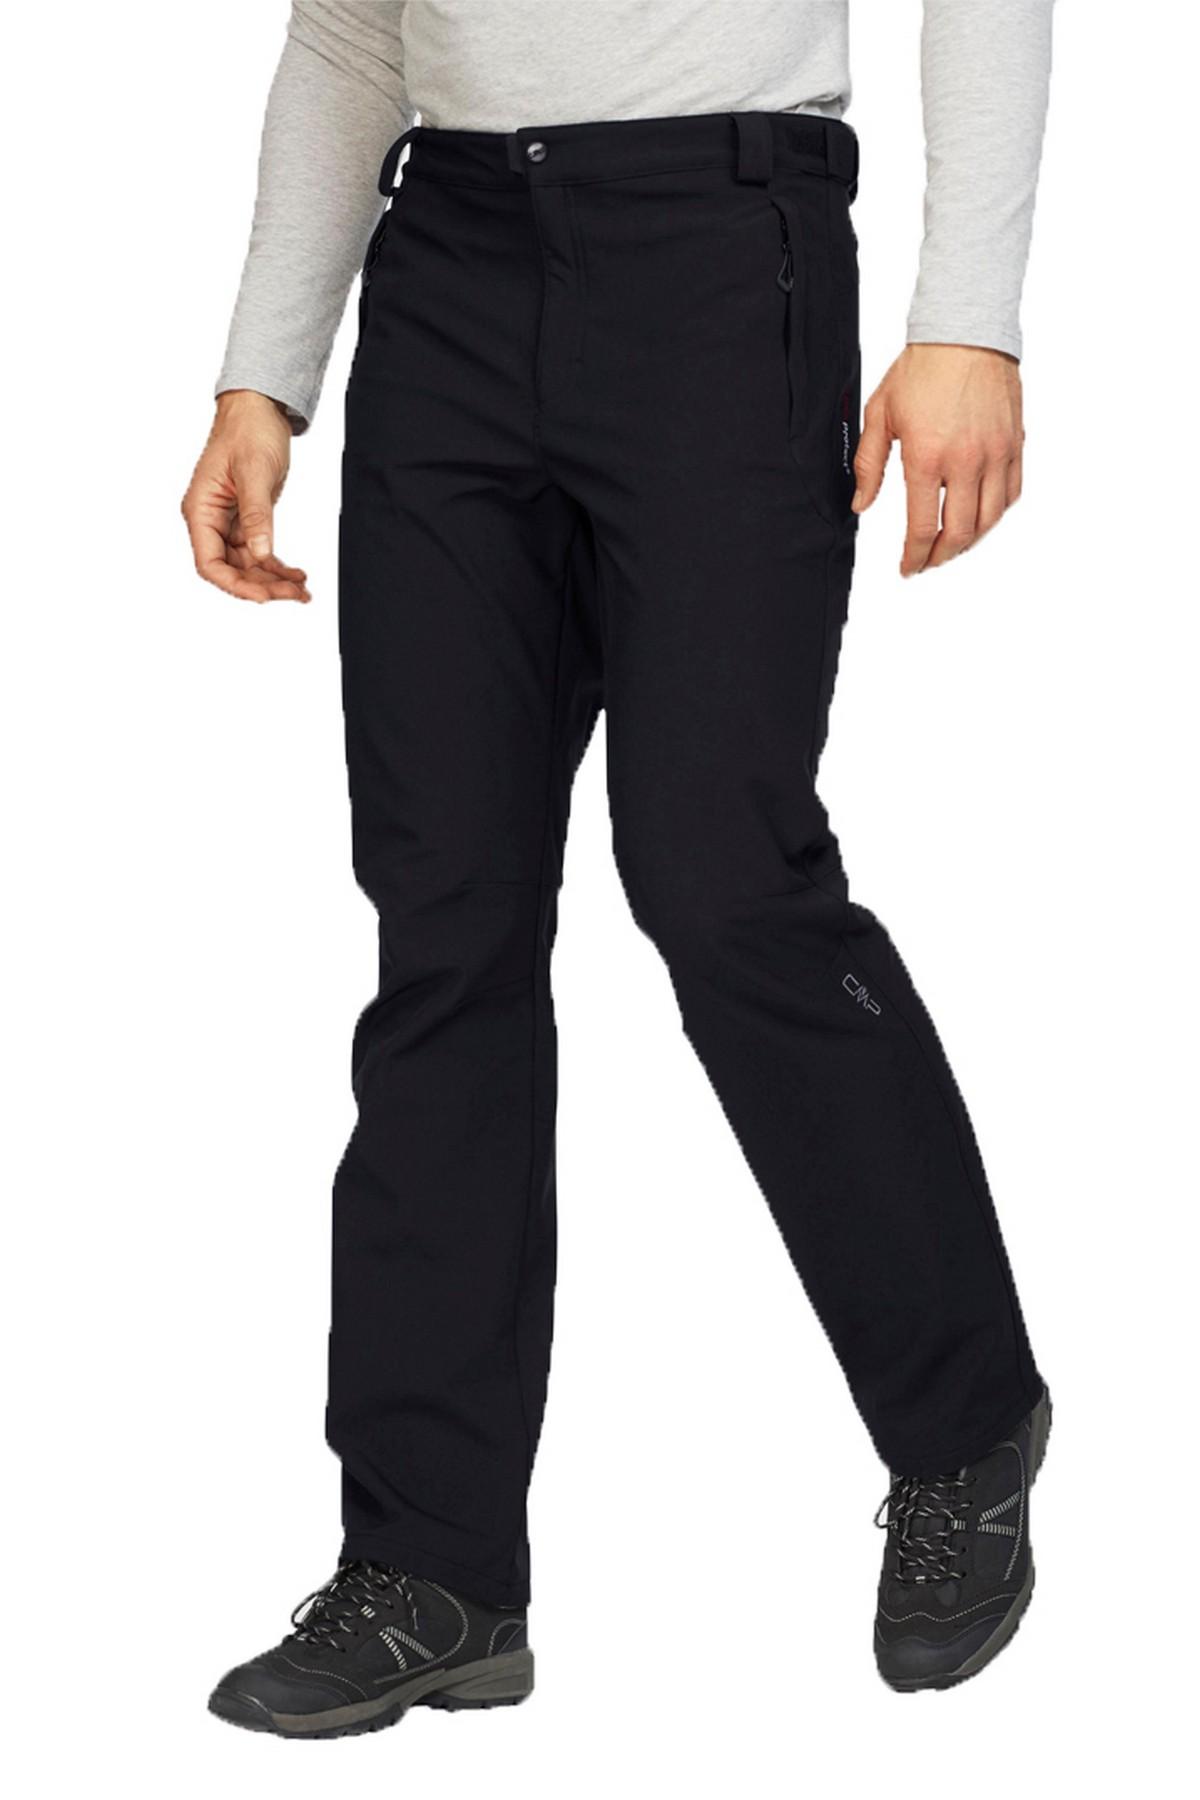 Cmp Man Erkek Softshell Pantolon (3A01487-N)